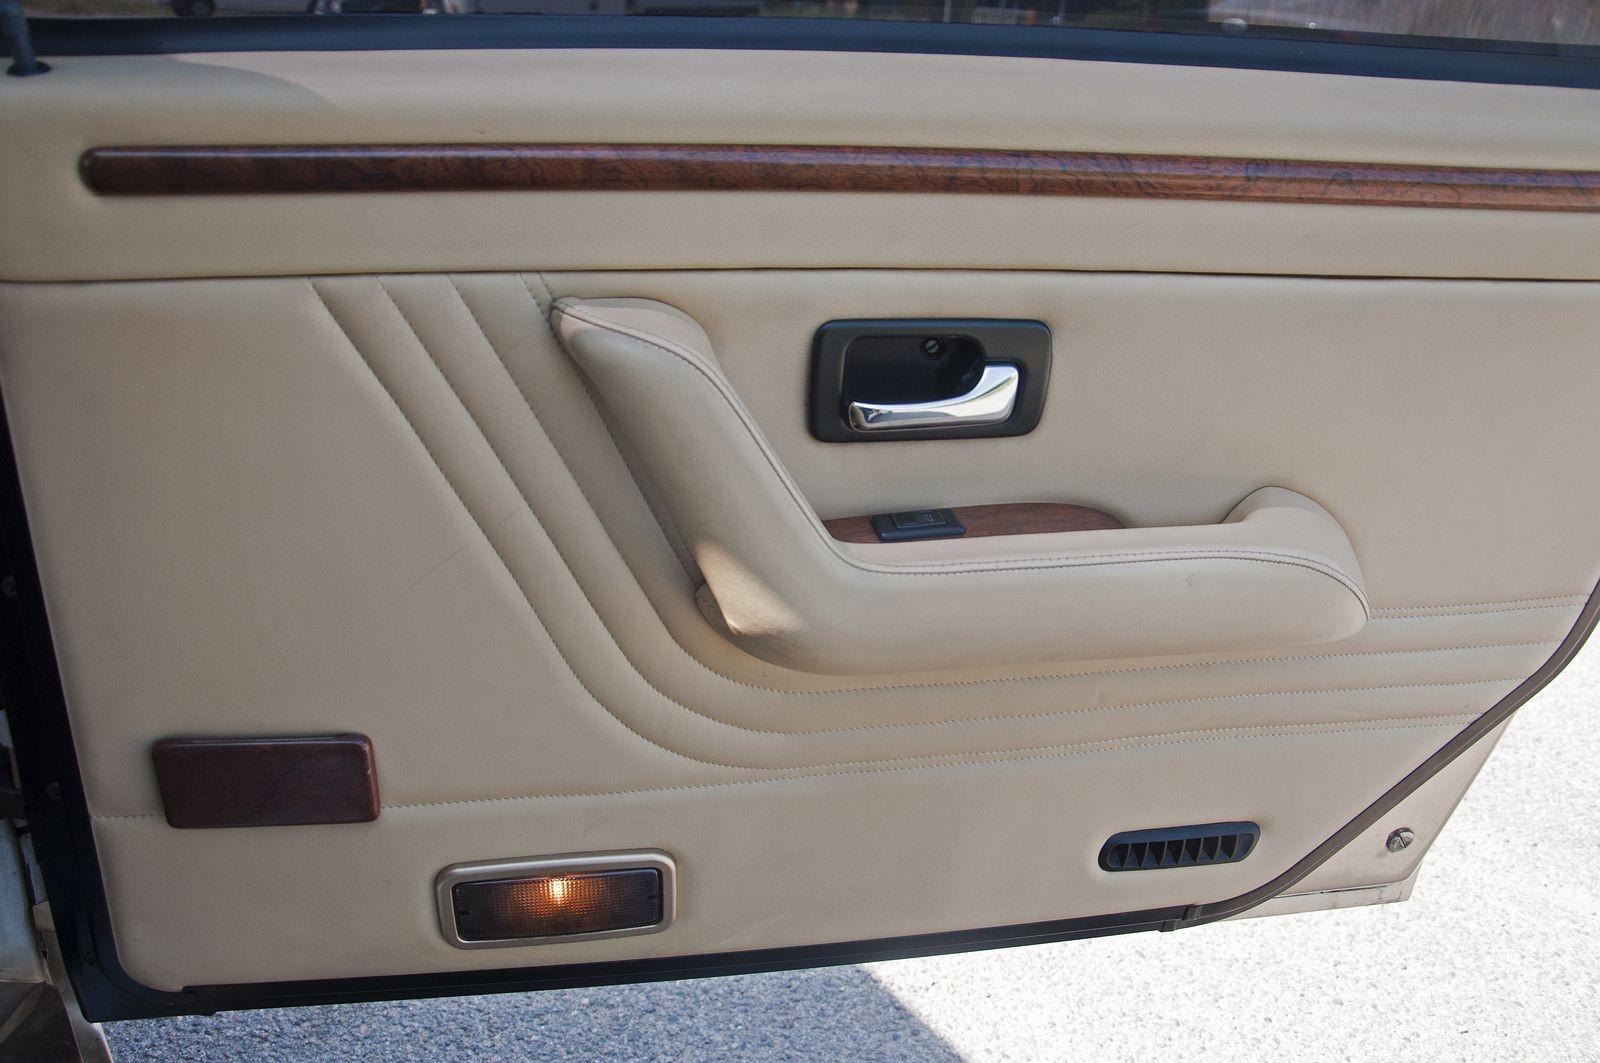 В харизме надо родиться: тест-драйв Tatra 700 Виктора Черномырдина